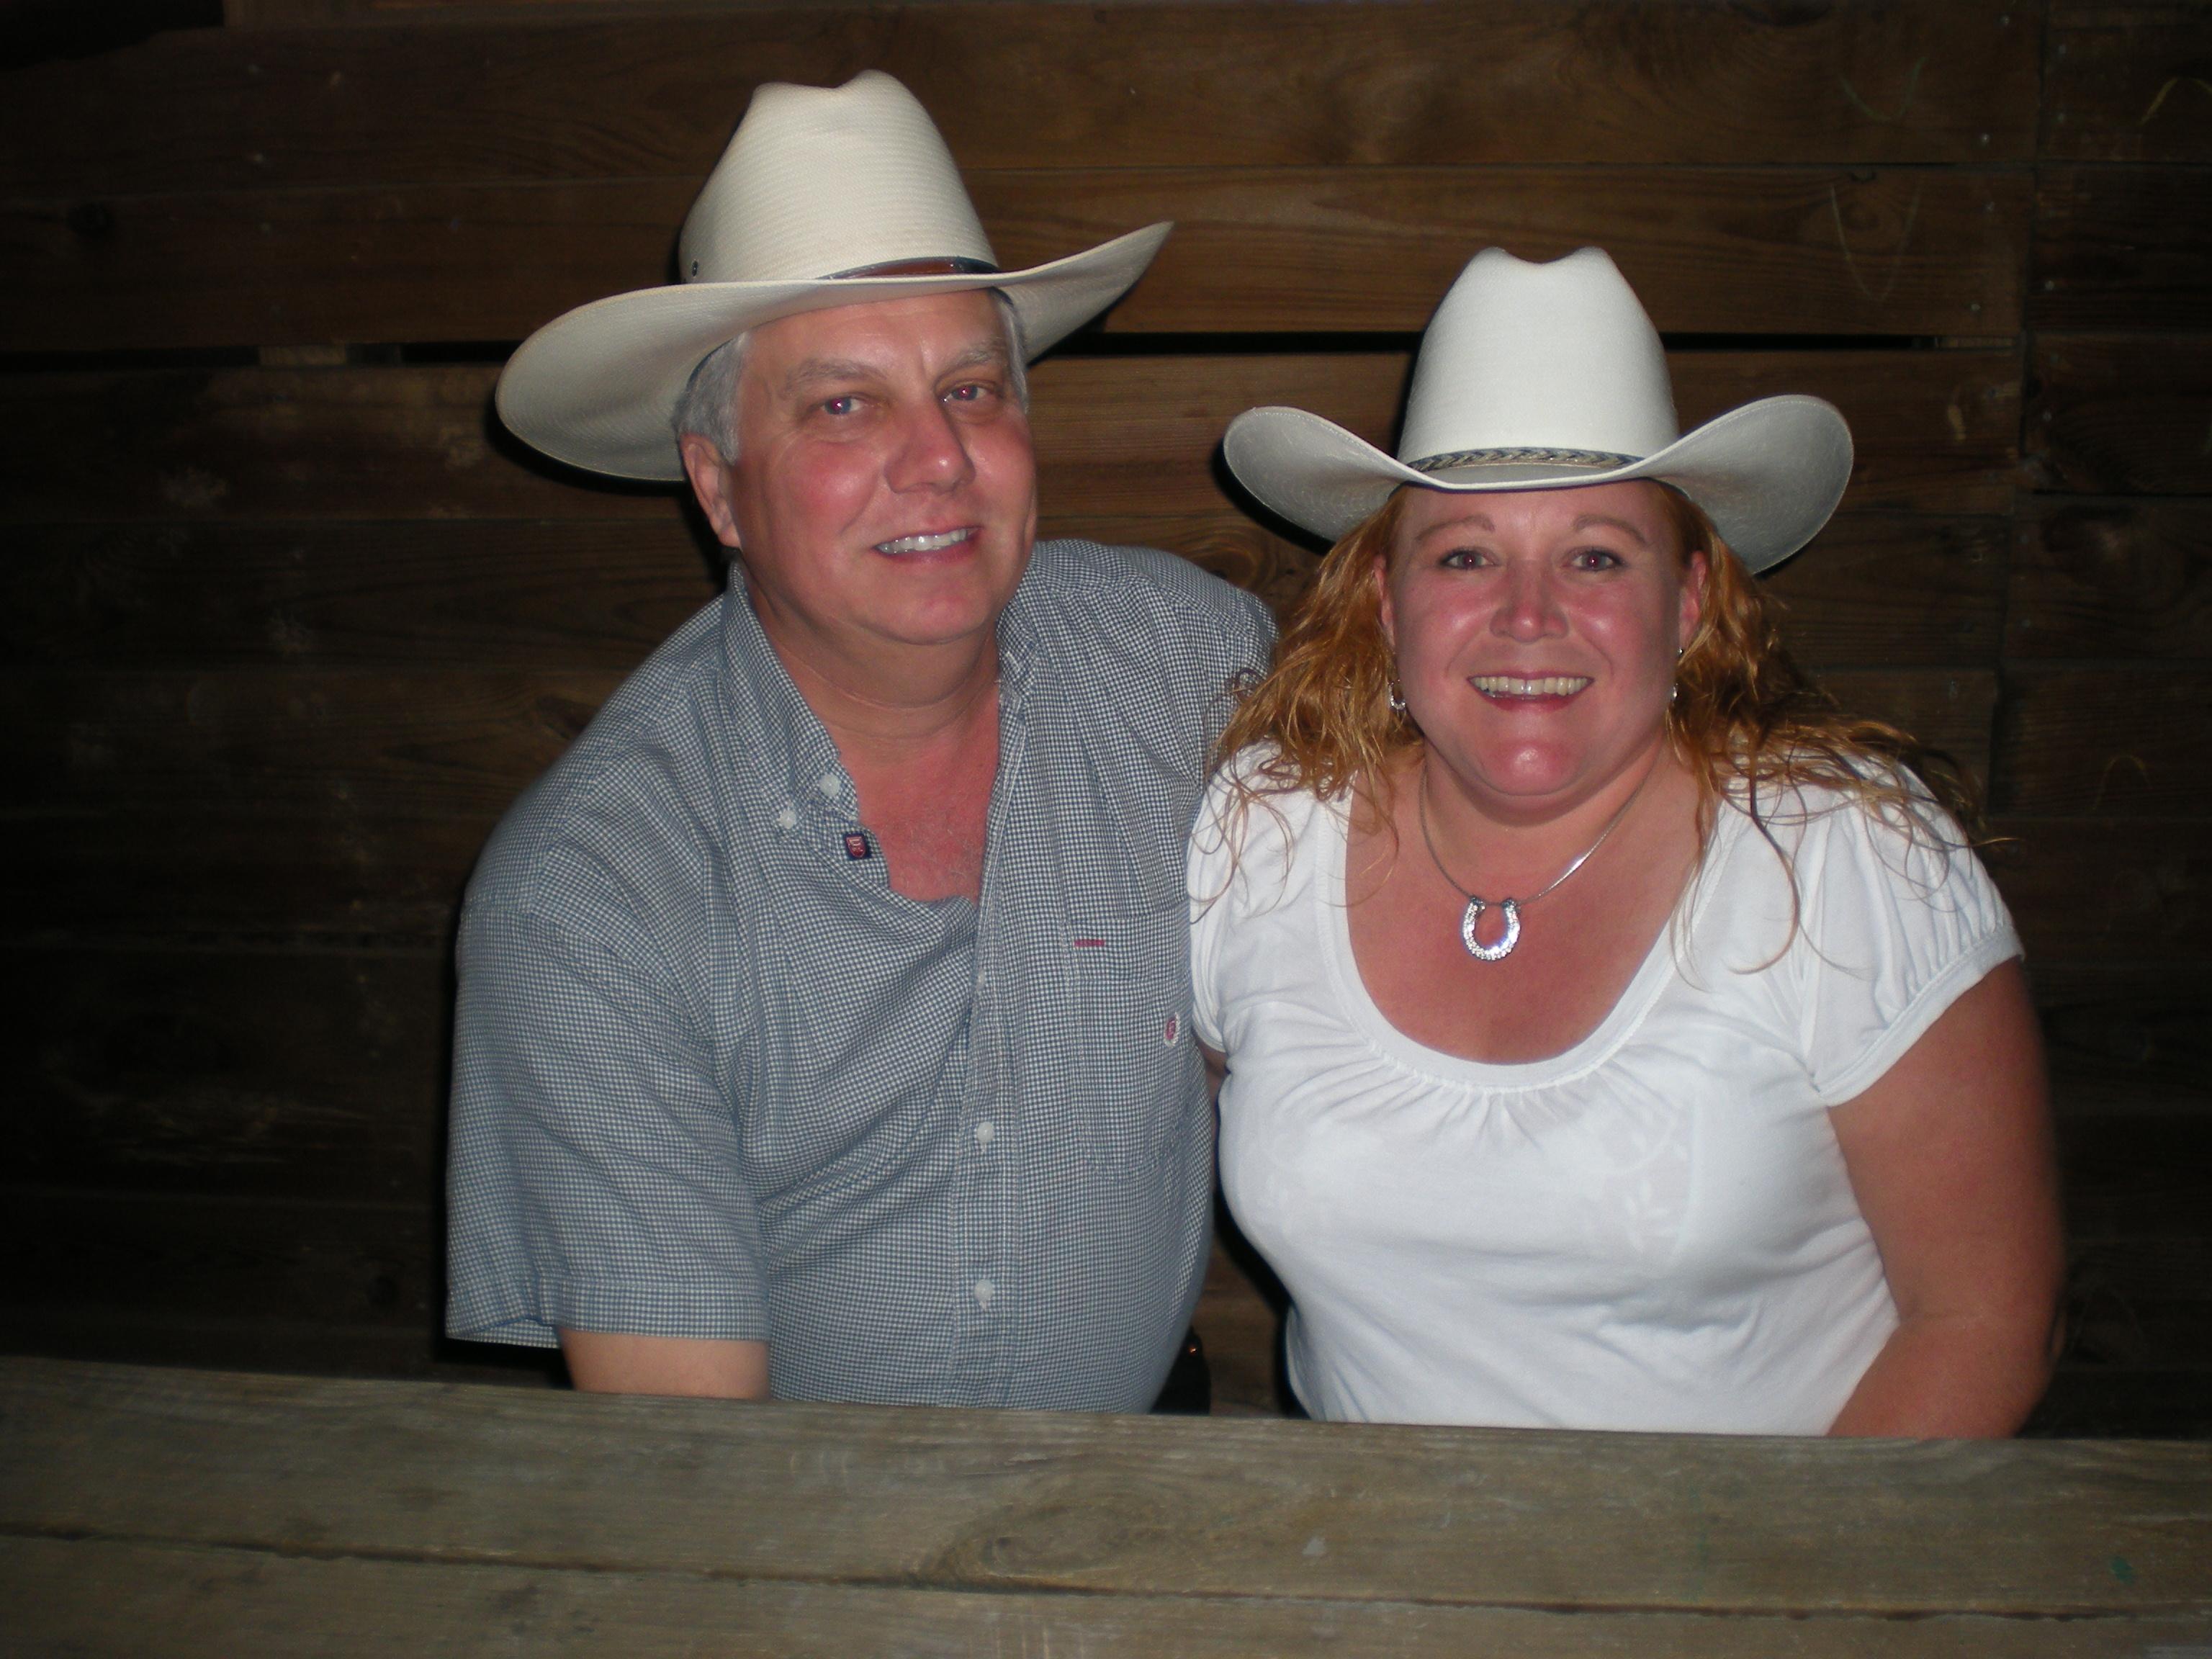 Michael and Kelli Lamb